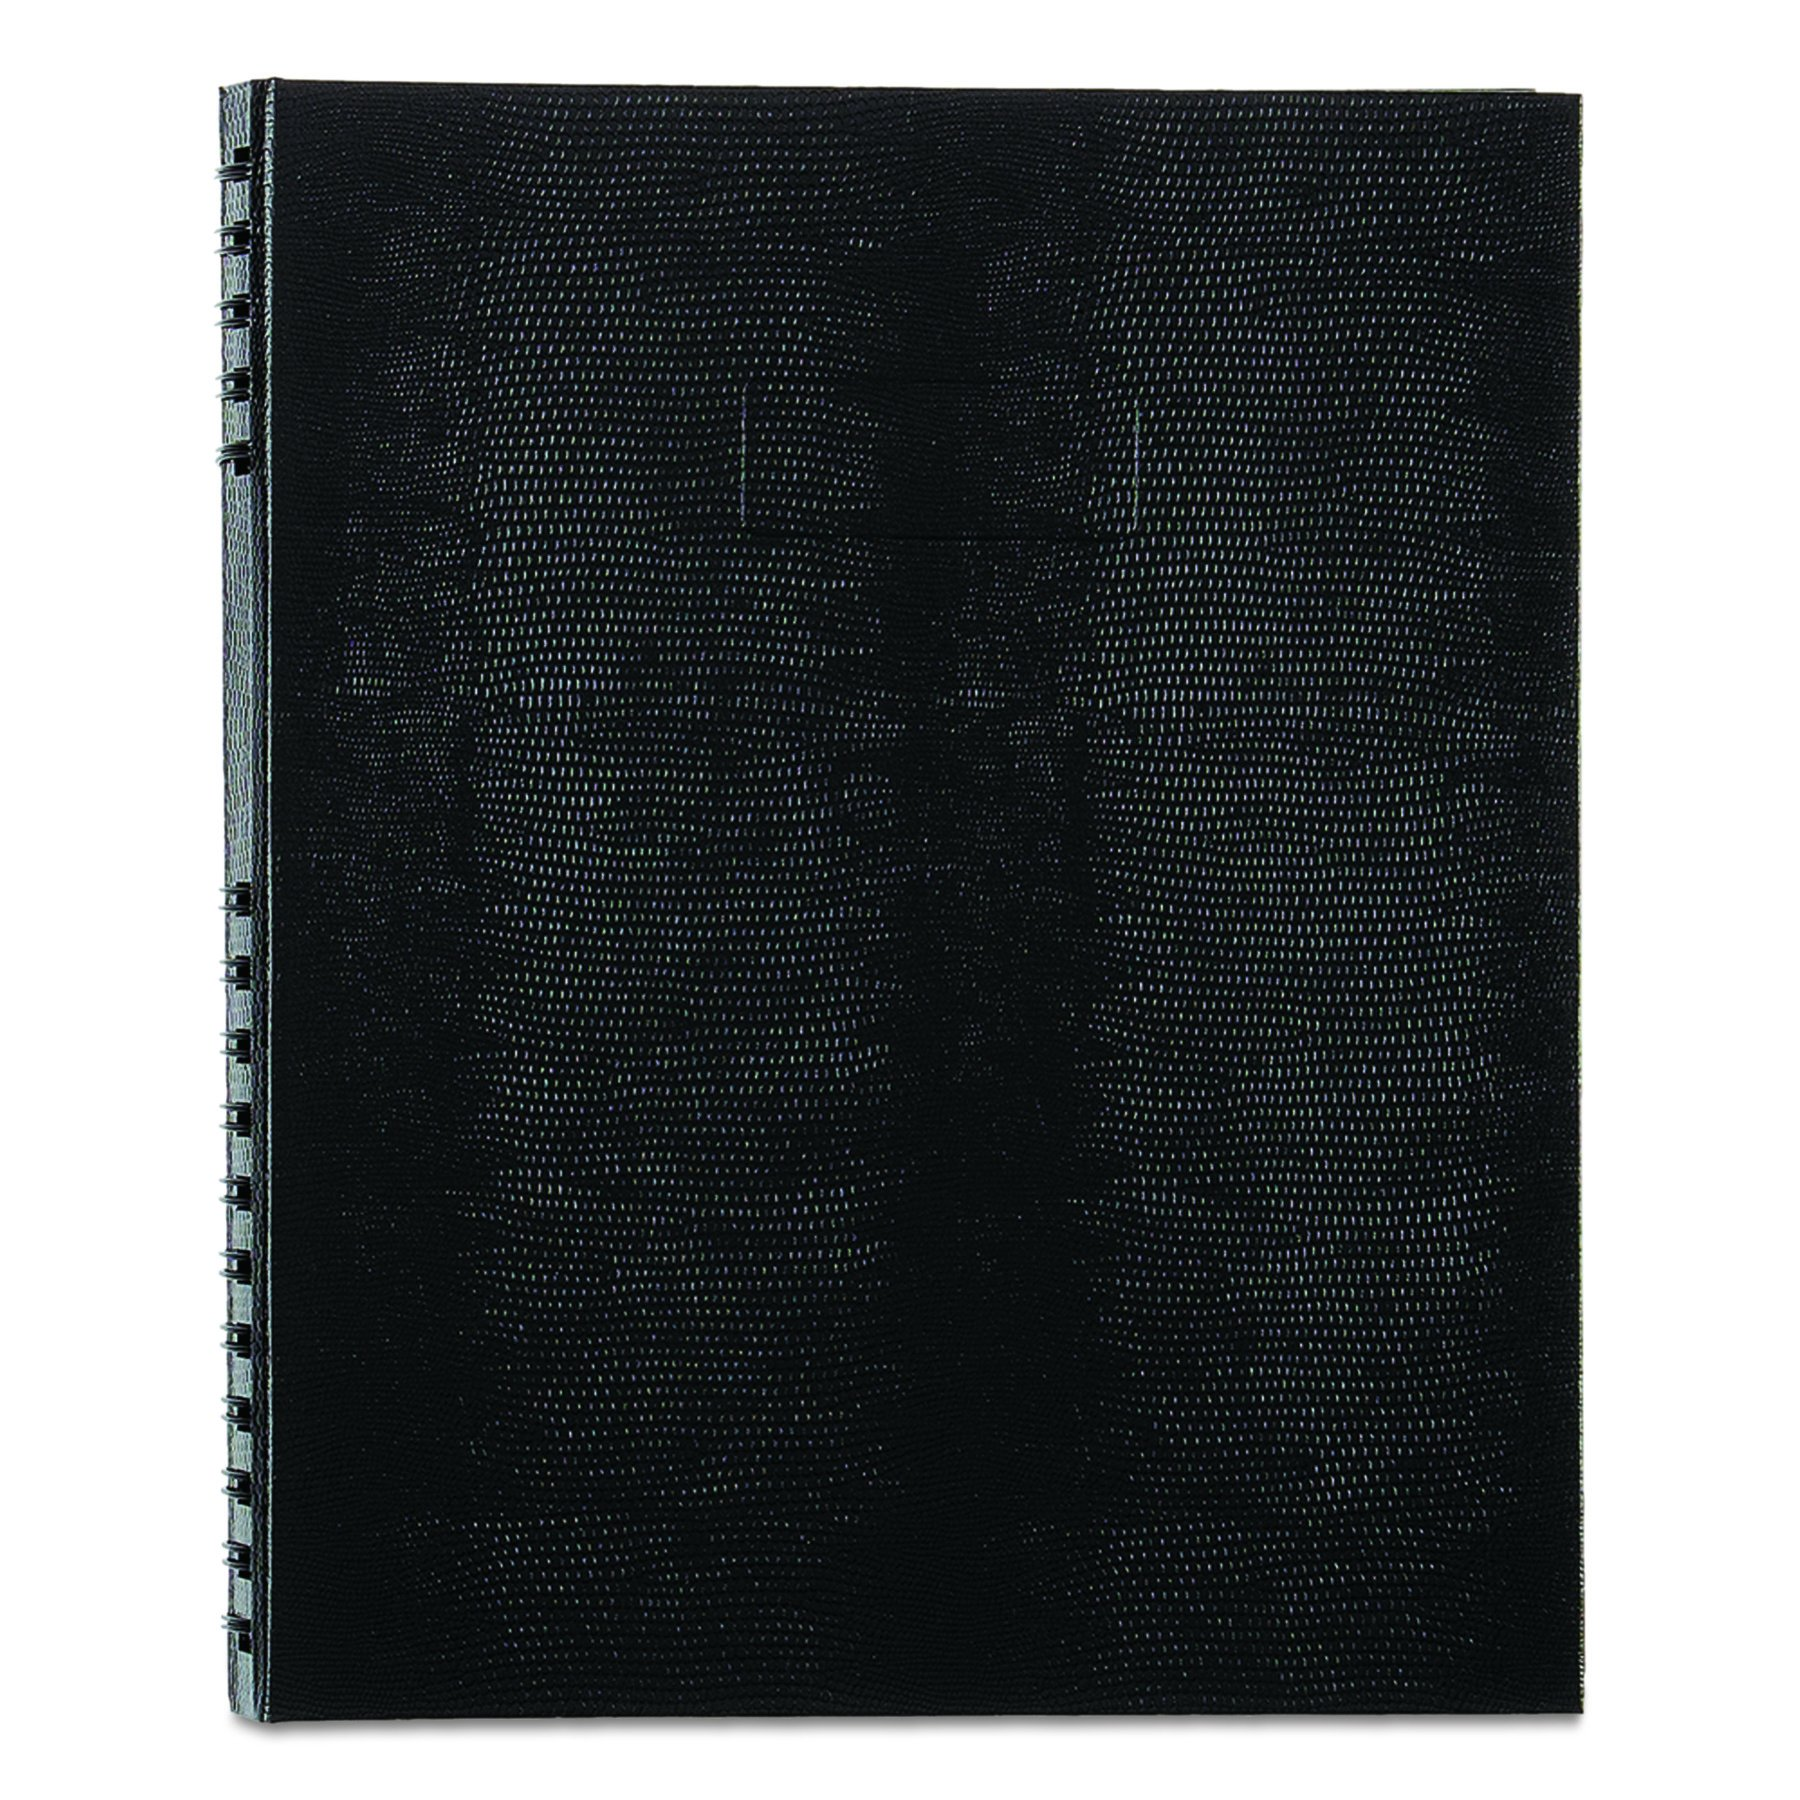 BLUELINE NotePro Notebook, Black, 11 x 8.5'' 200 Pages (A10200.BLK) by Blueline (Image #1)